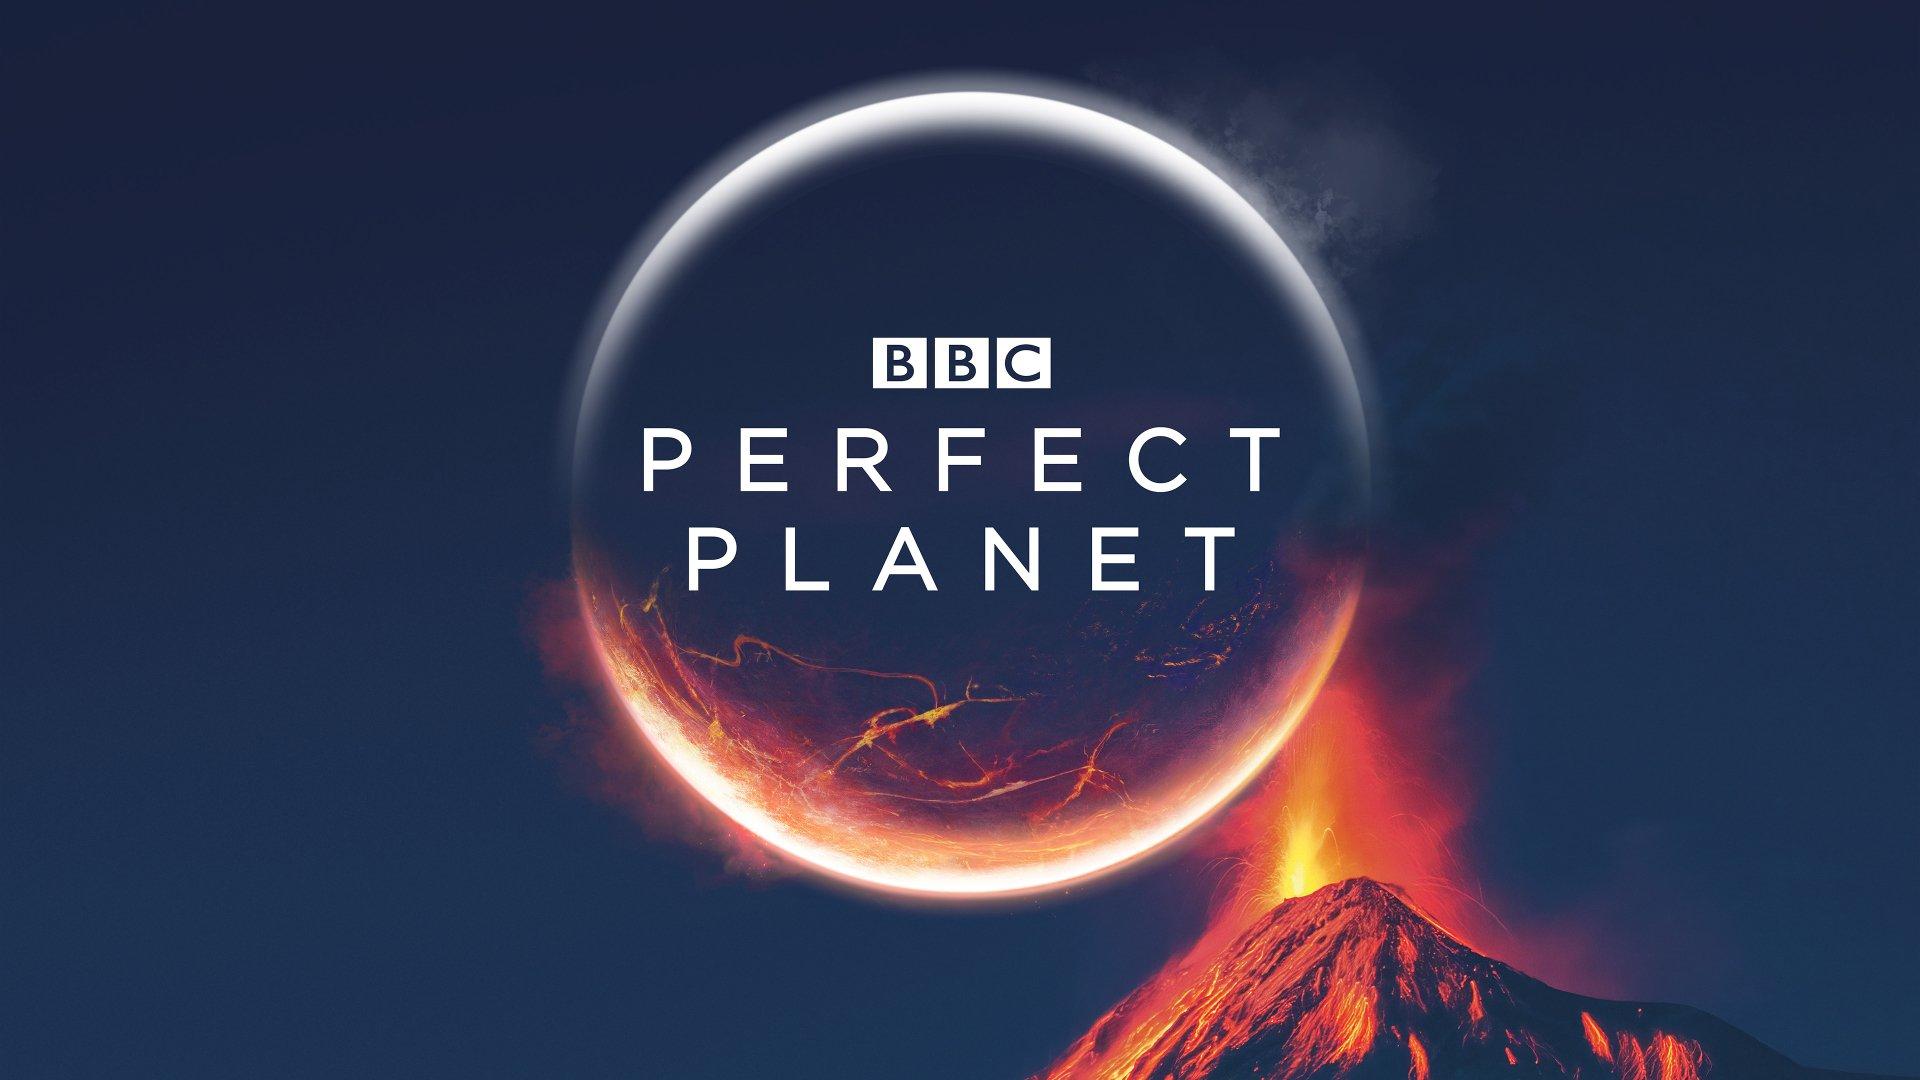 دانلود زیرنویس فارسی سریال A Perfect Planet